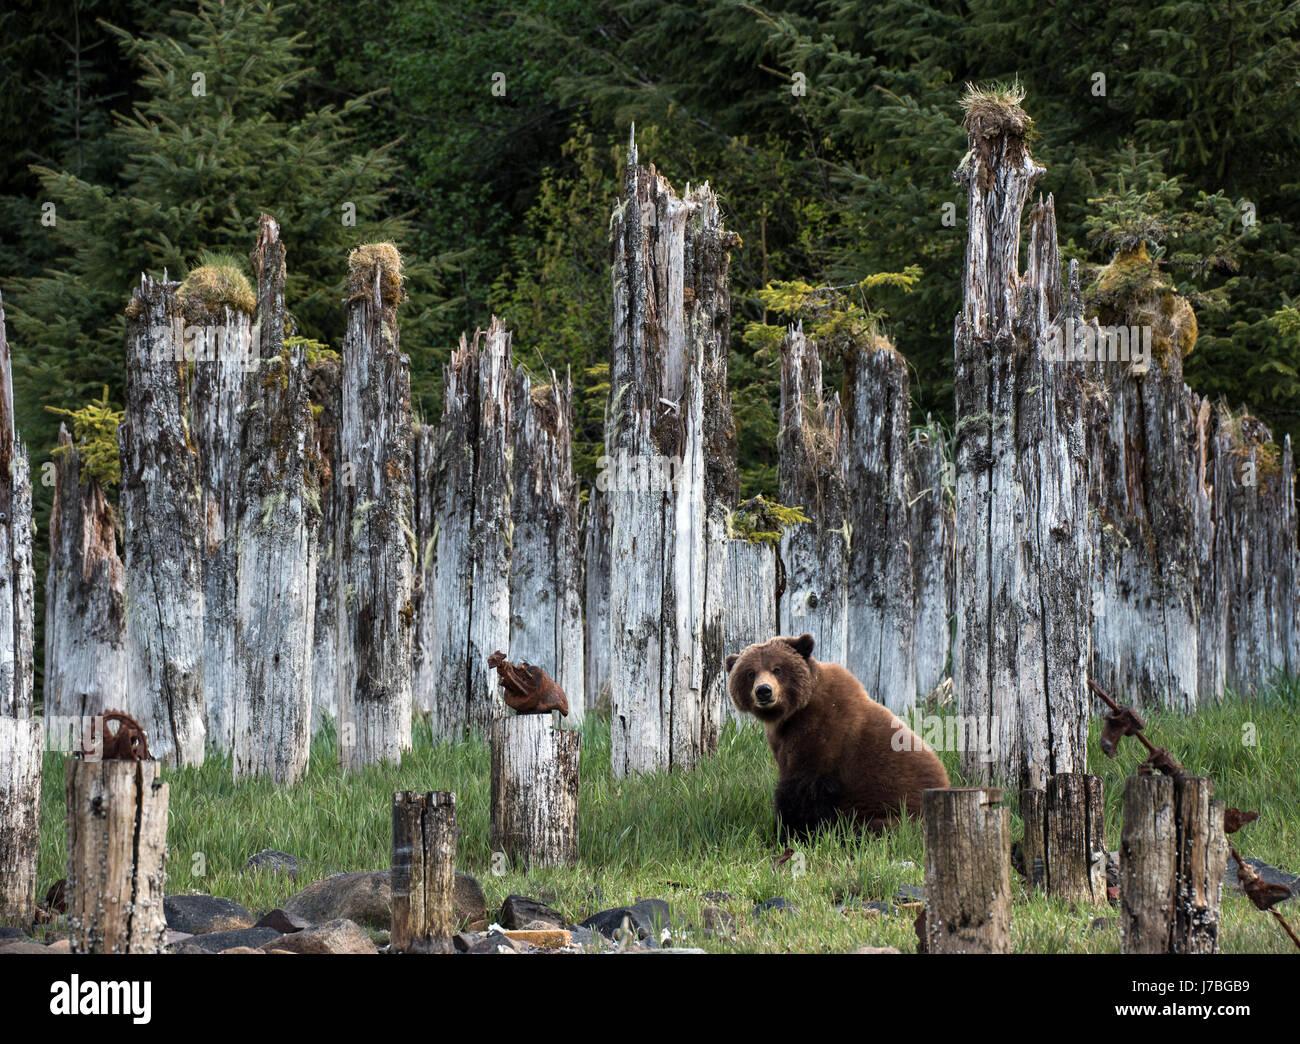 A brown bear sits amongst pilings at Taku Harbor, Alaska - Stock Image